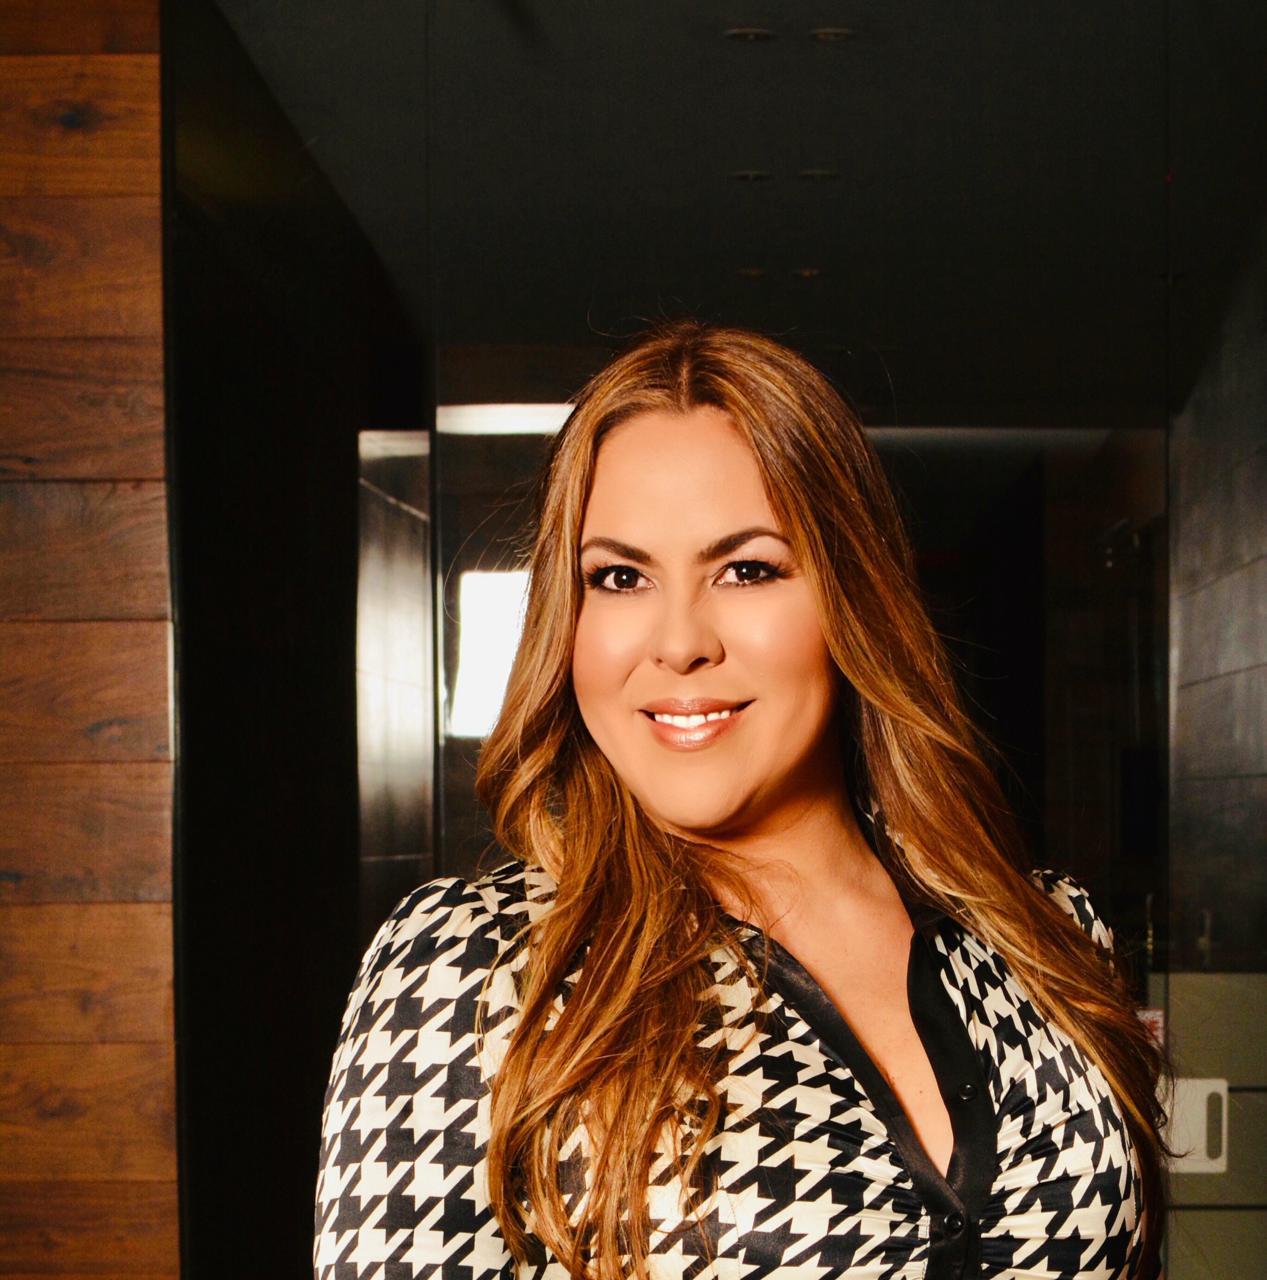 Sonia_Cabrera_Founder_Luxury_Habitat_Real_Estate.jpg